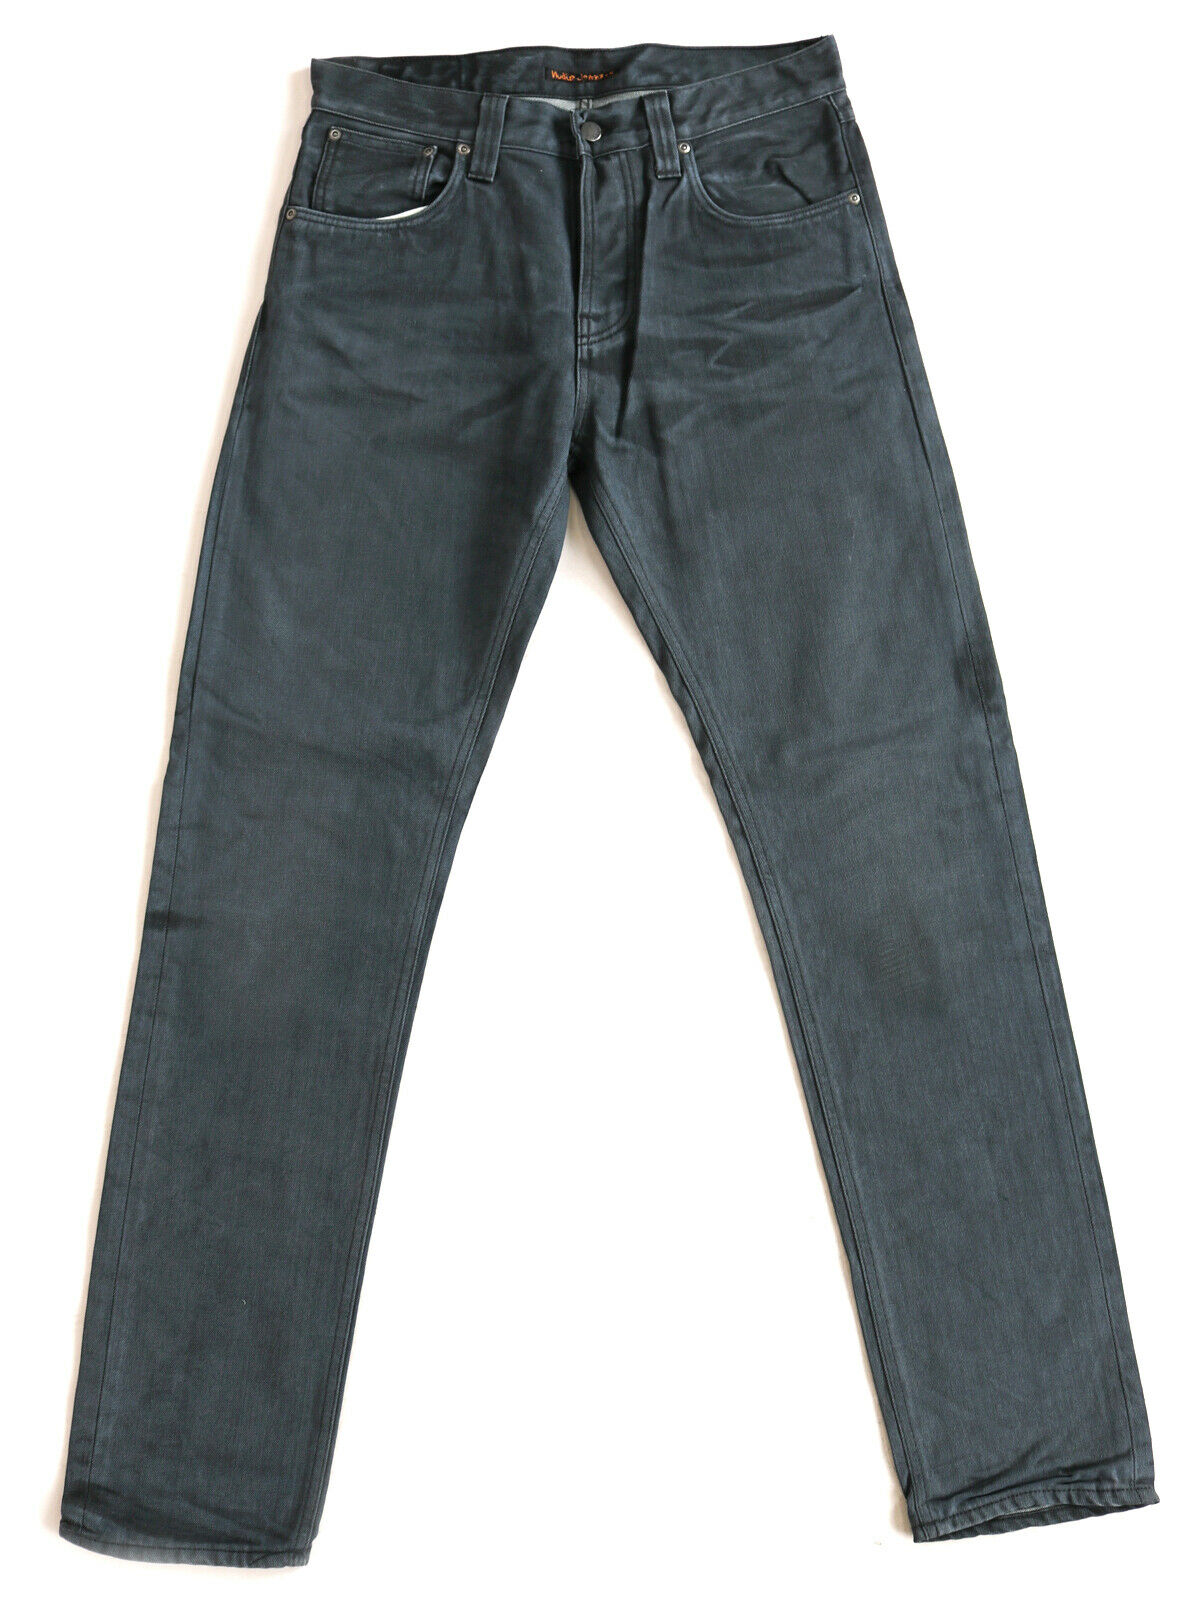 Nuovo Nudie Uomo Jeans Pantaloni Costante Eddie Regular Tapered Fit W32 L34